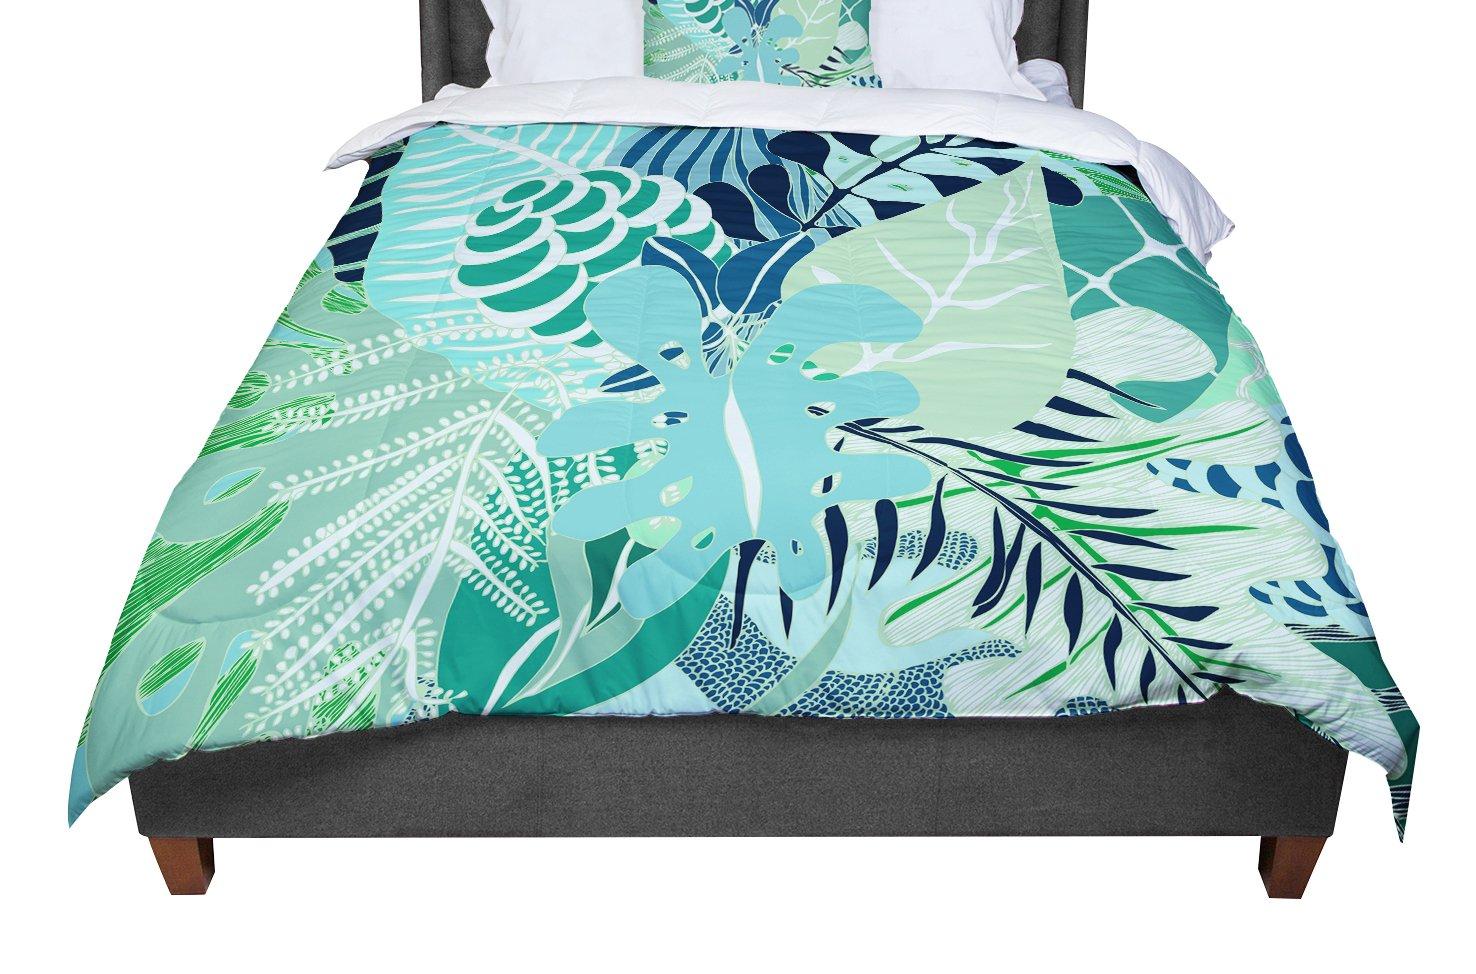 KESS InHouse Anchobee Giungla Green Floral King 104 X 88 Cal King Comforter